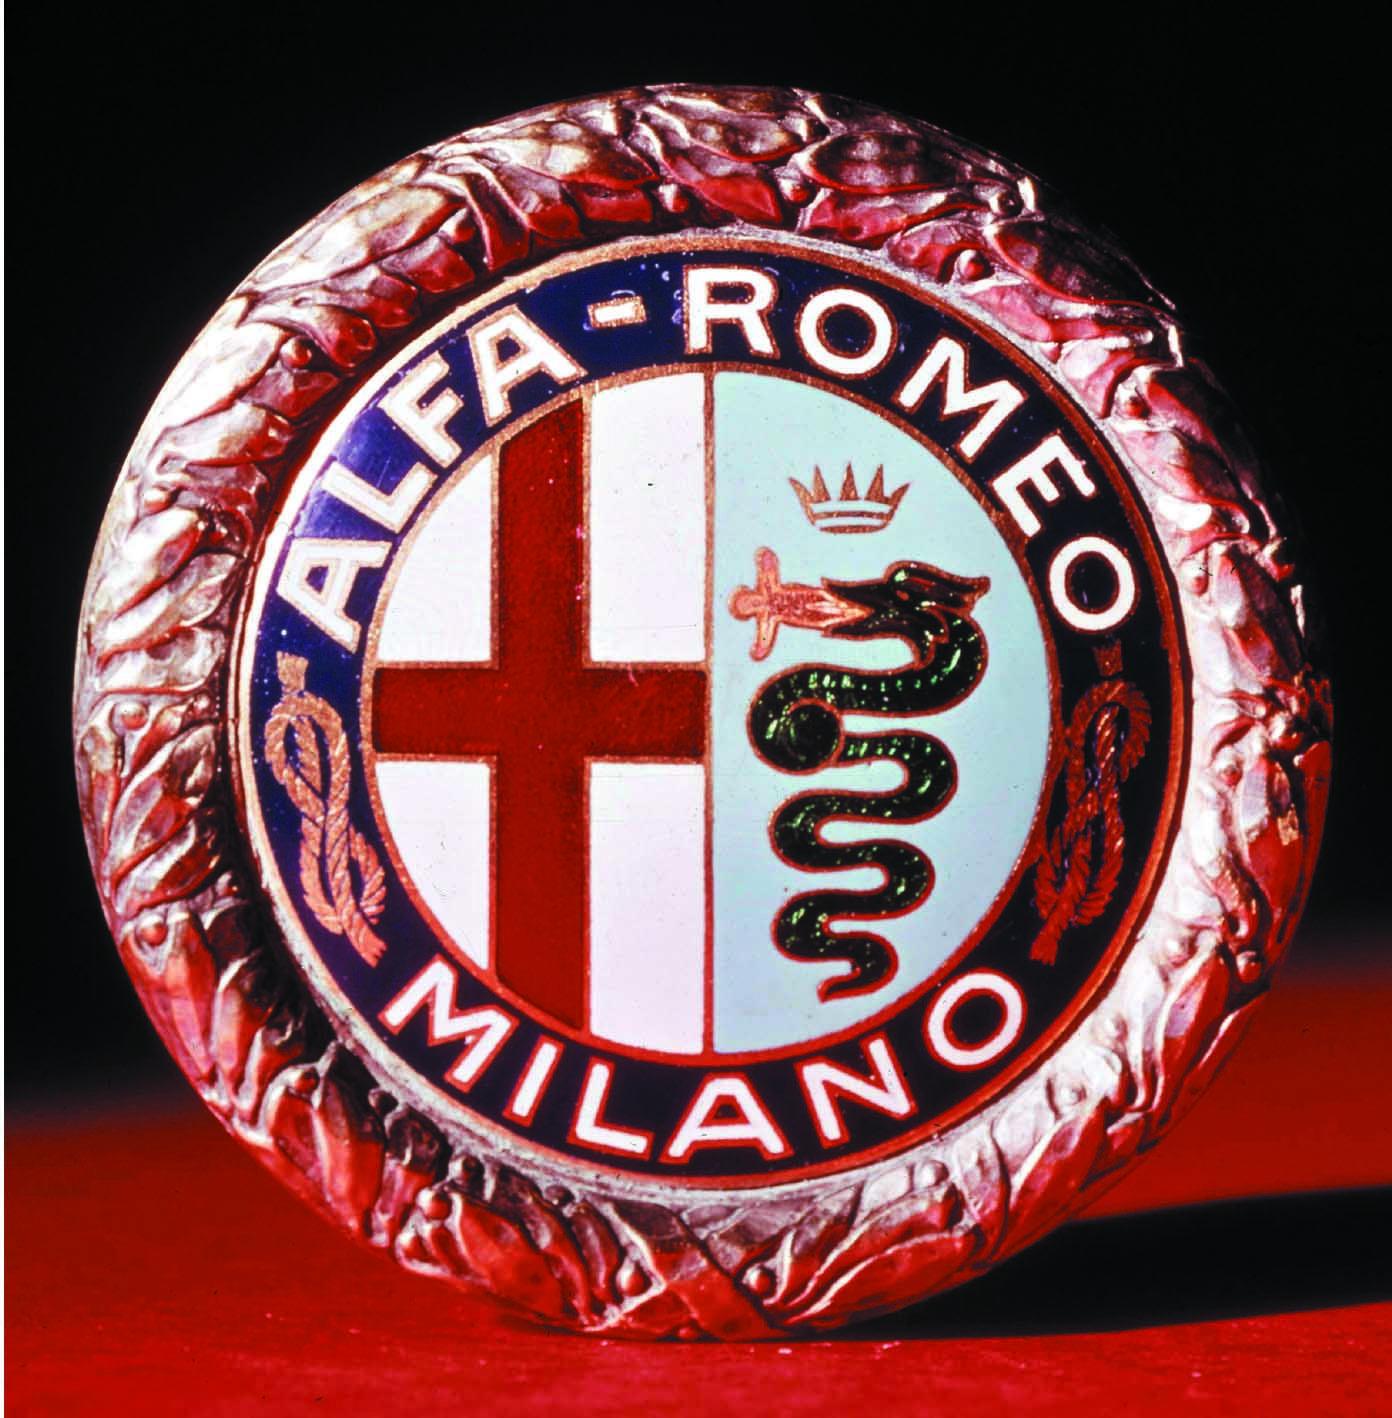 Alfa Romeo Logos - Brochures